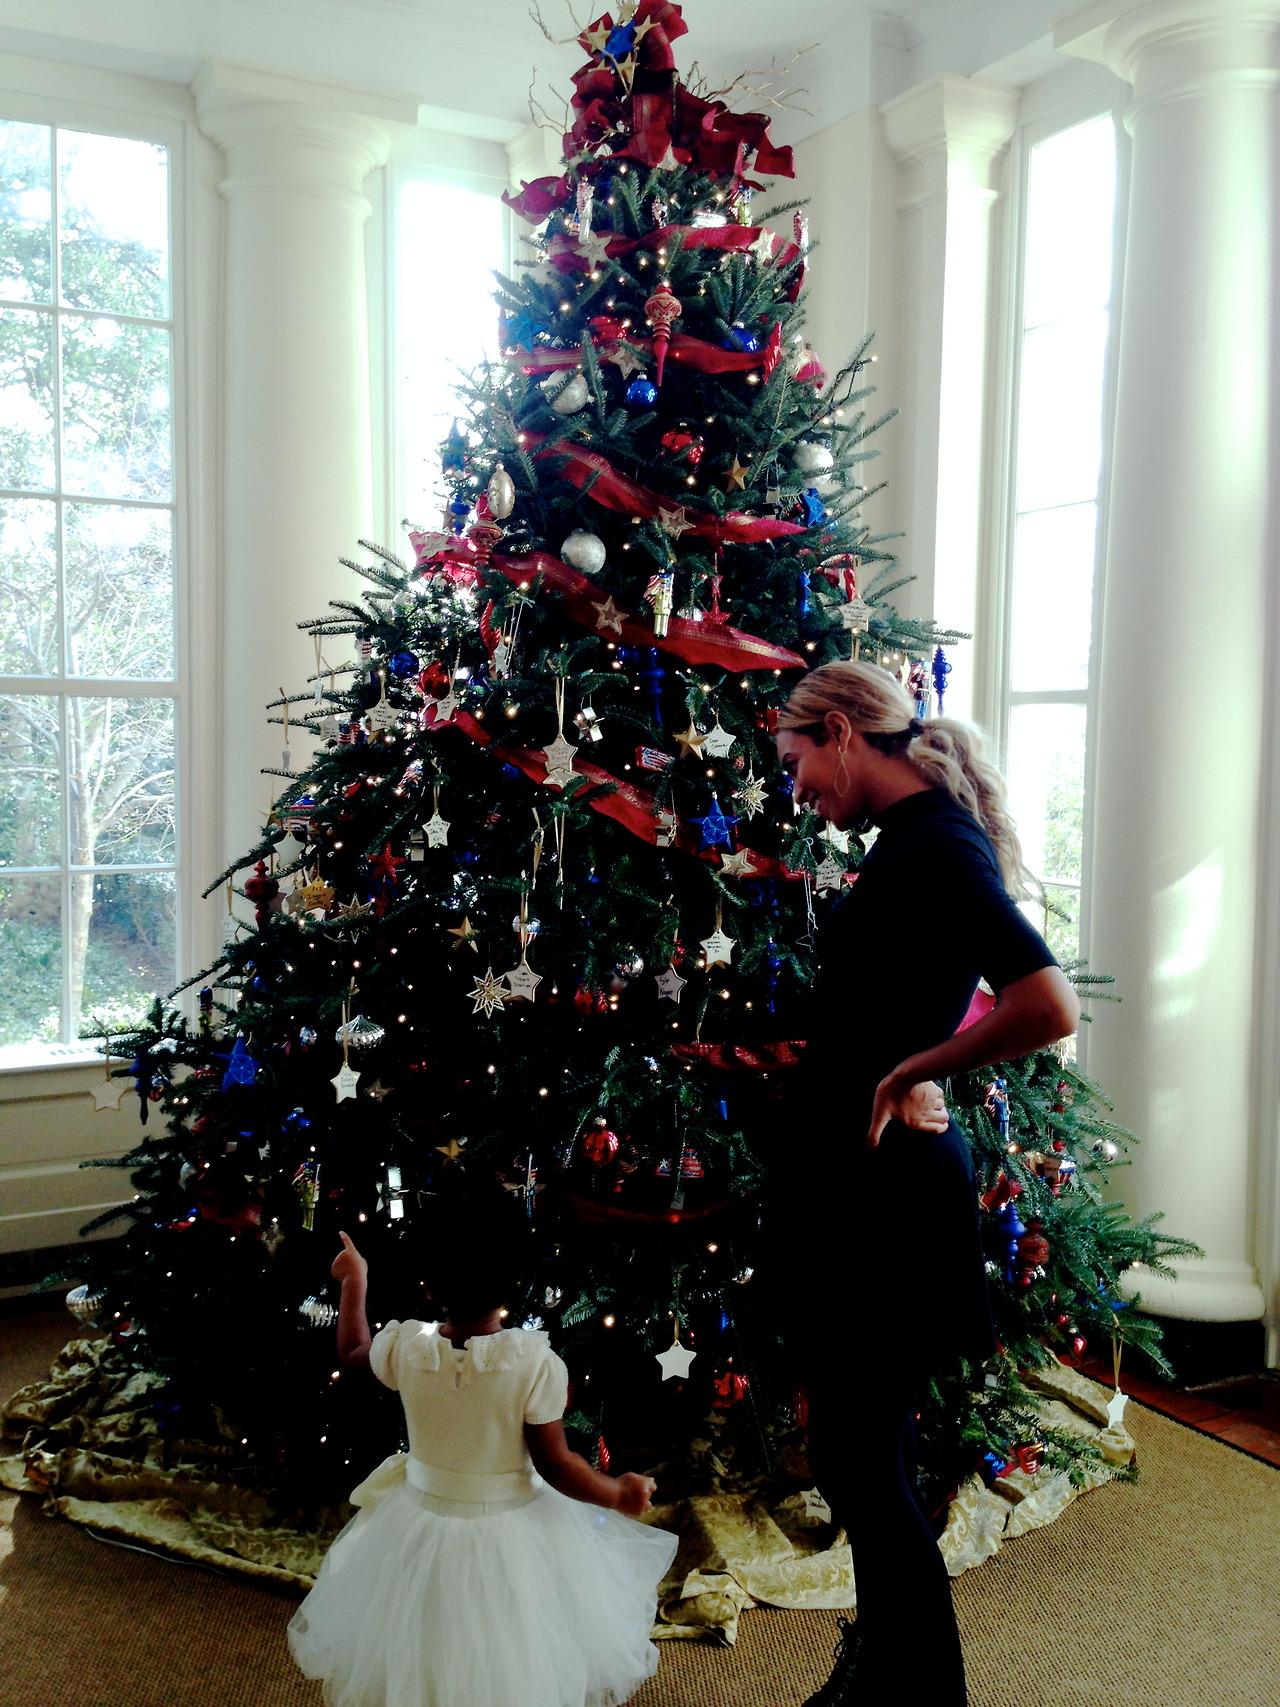 She celebrates the holidays in style.